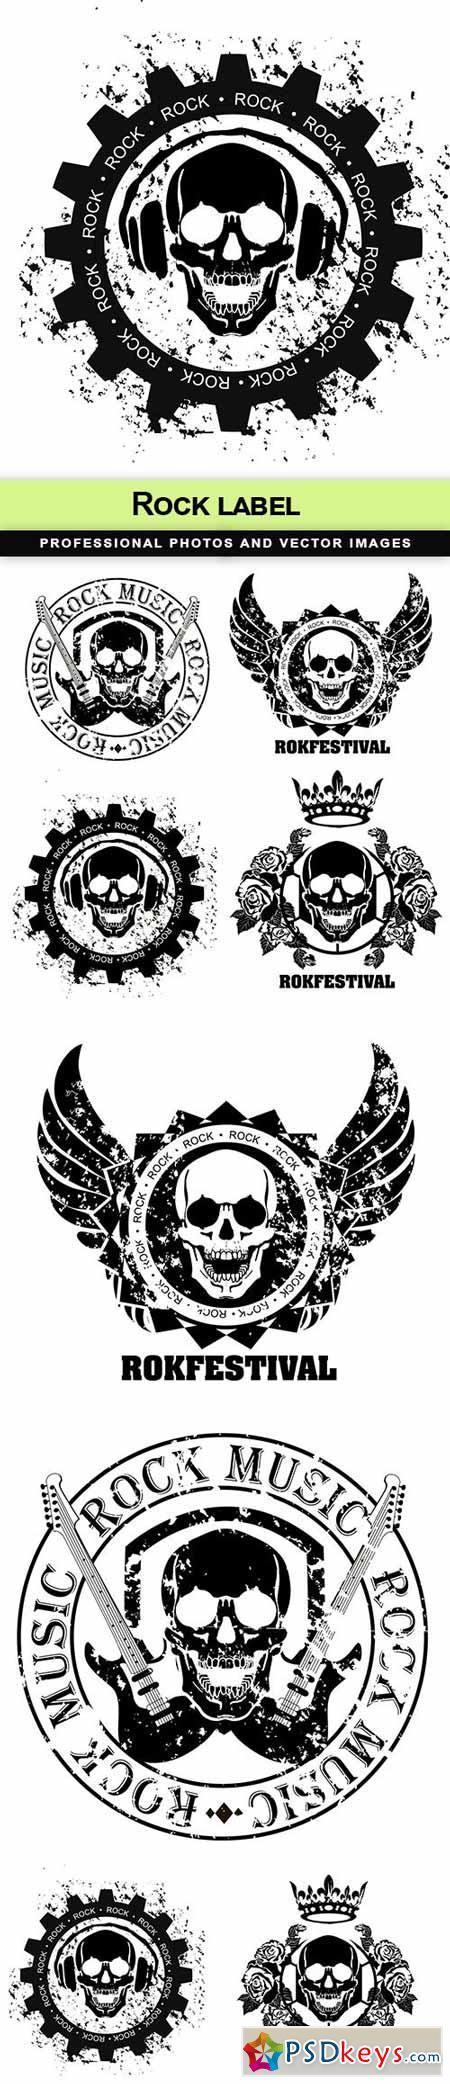 Rock label - 5 EPS